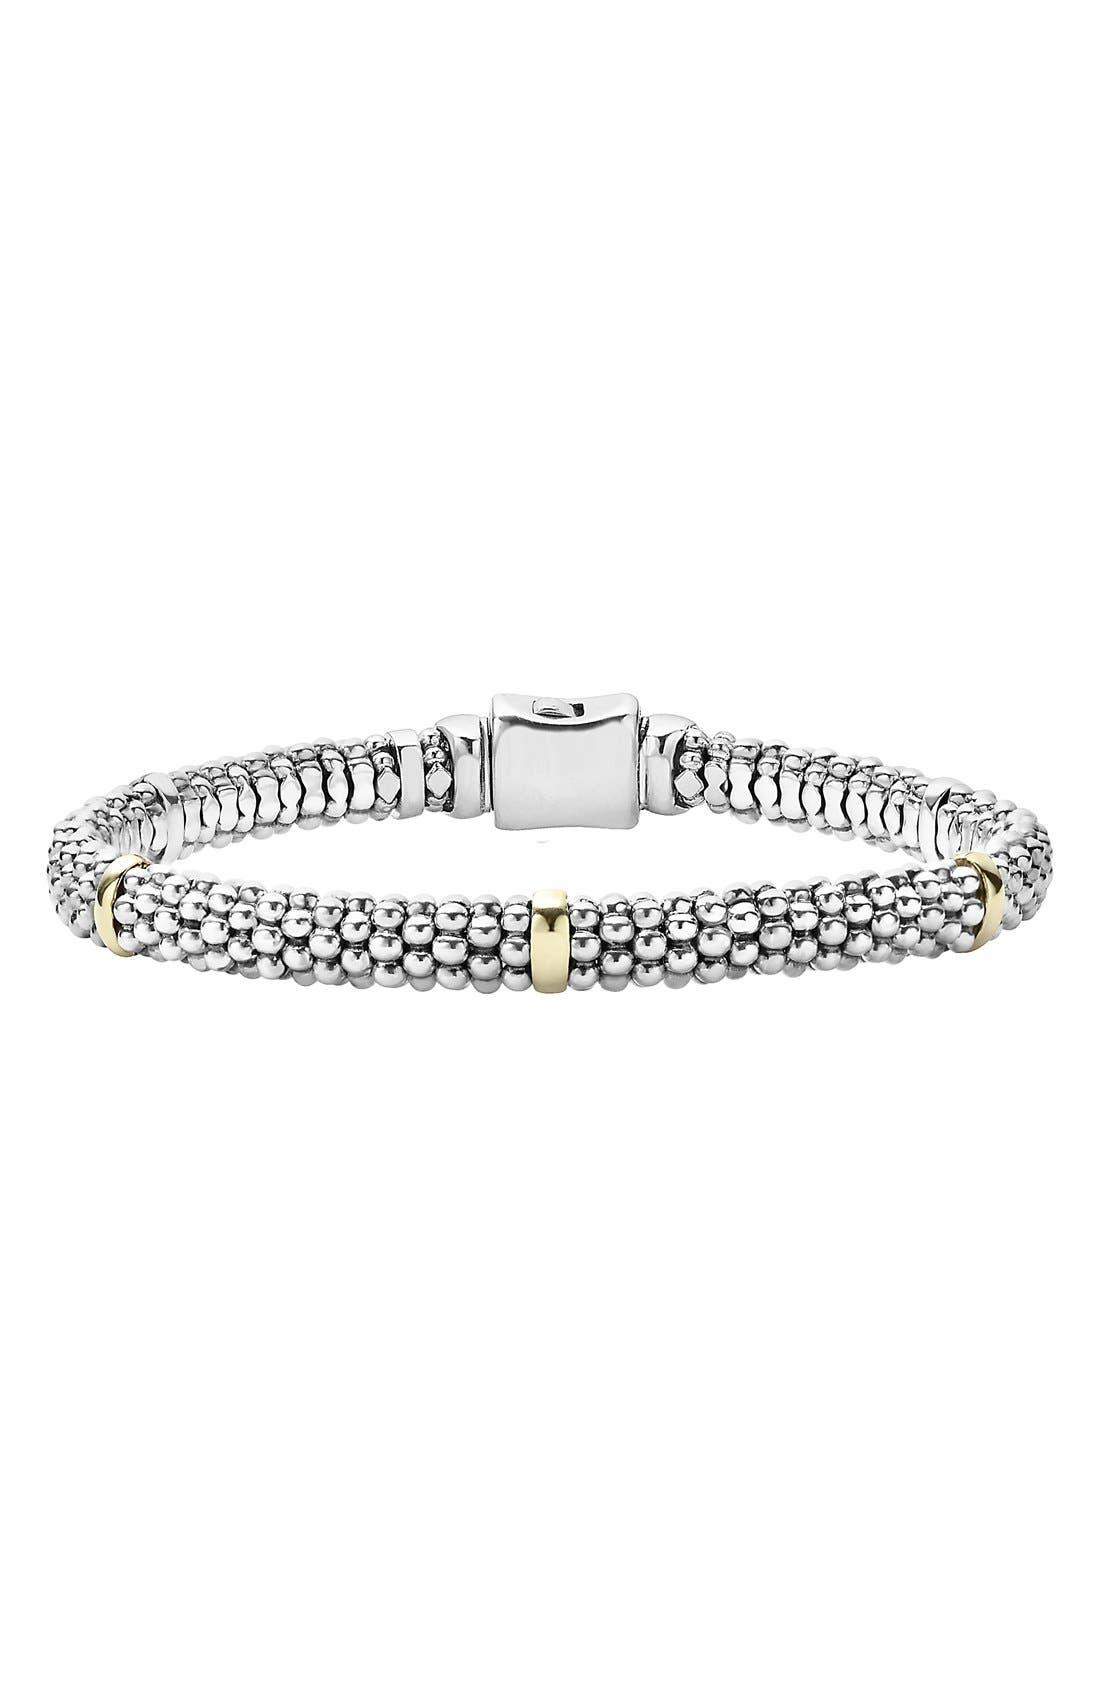 Alternate Image 1 Selected - LAGOS Caviar™ Rope Station Bracelet